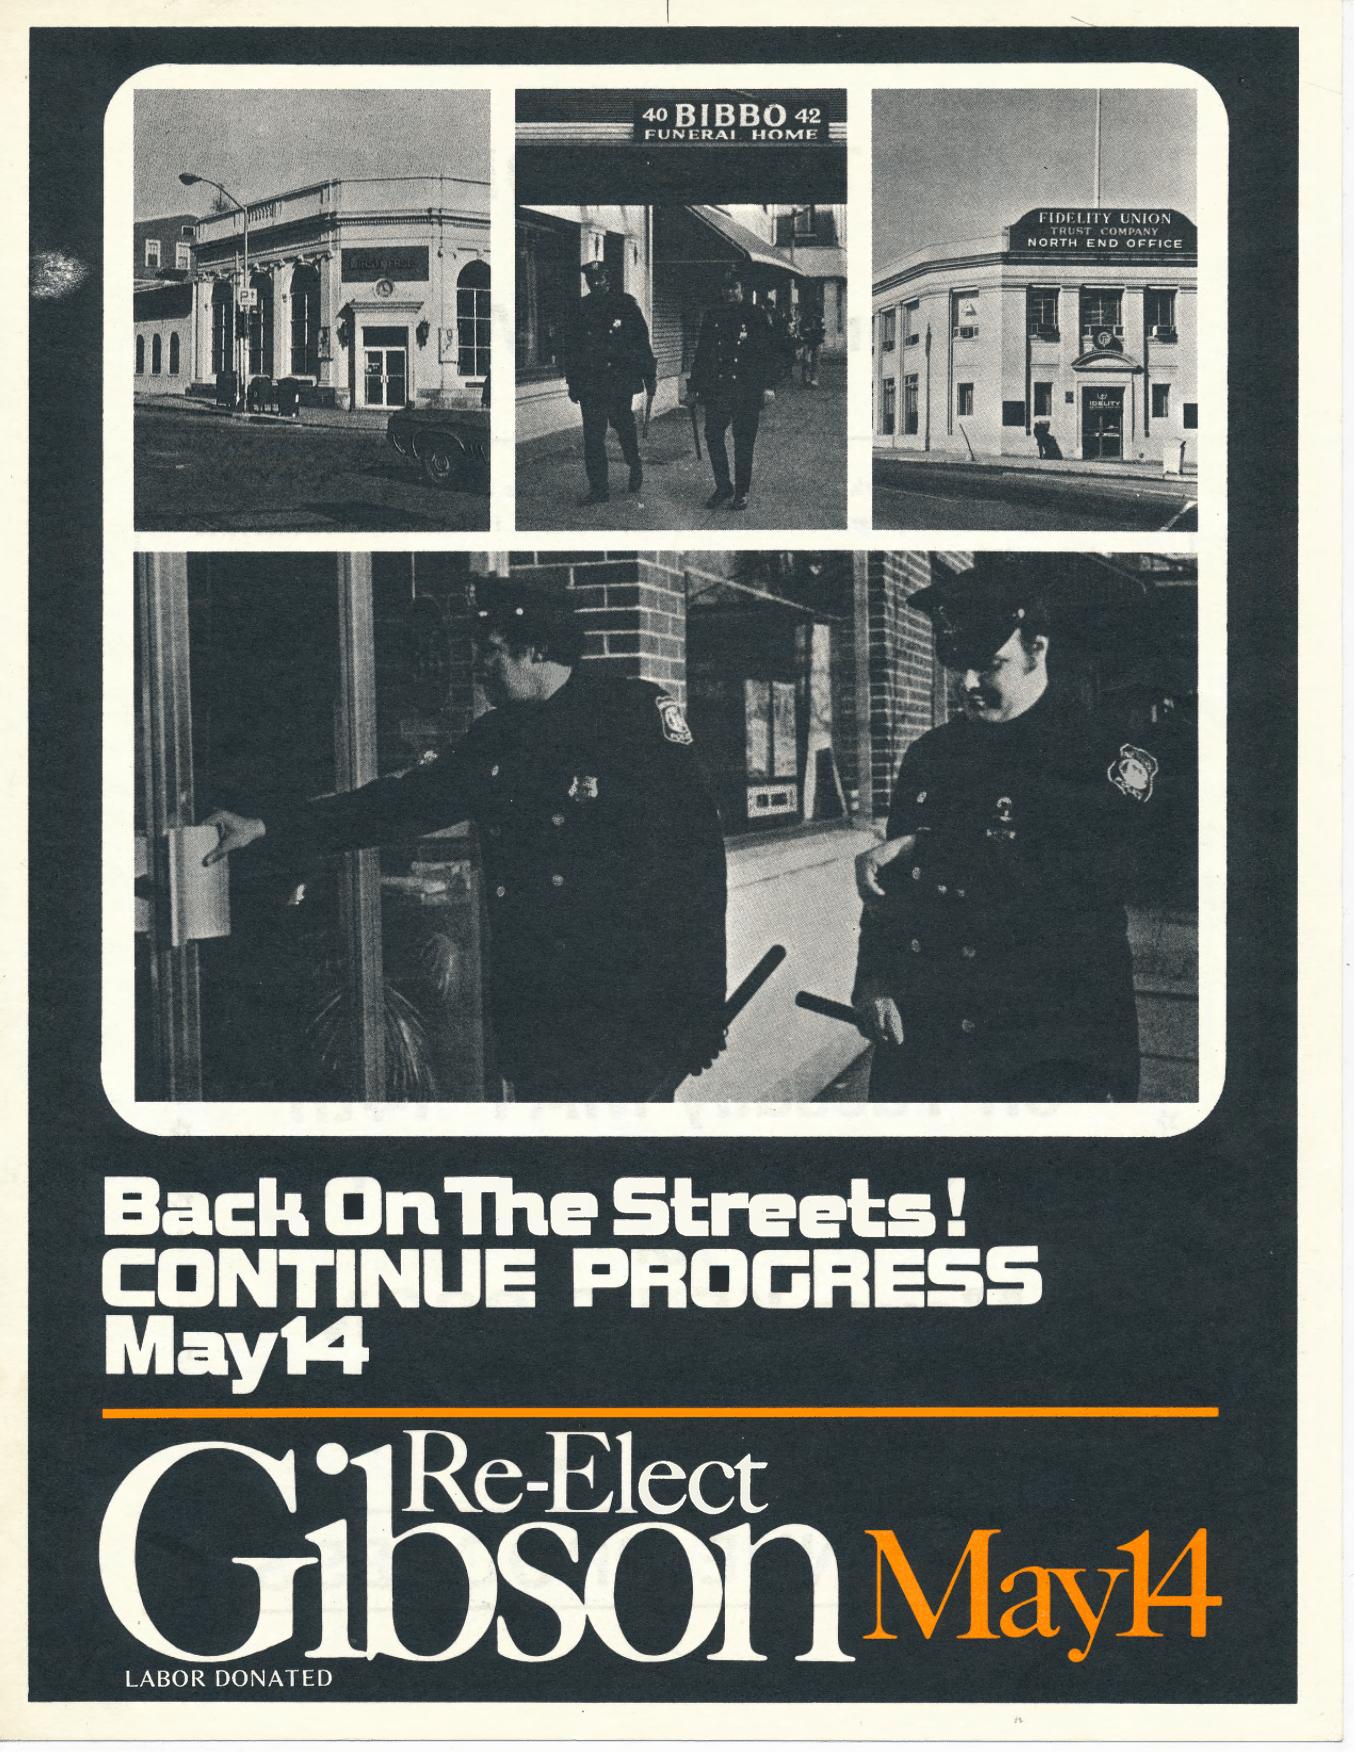 Ken Gibson Campaign Flyer (1974)